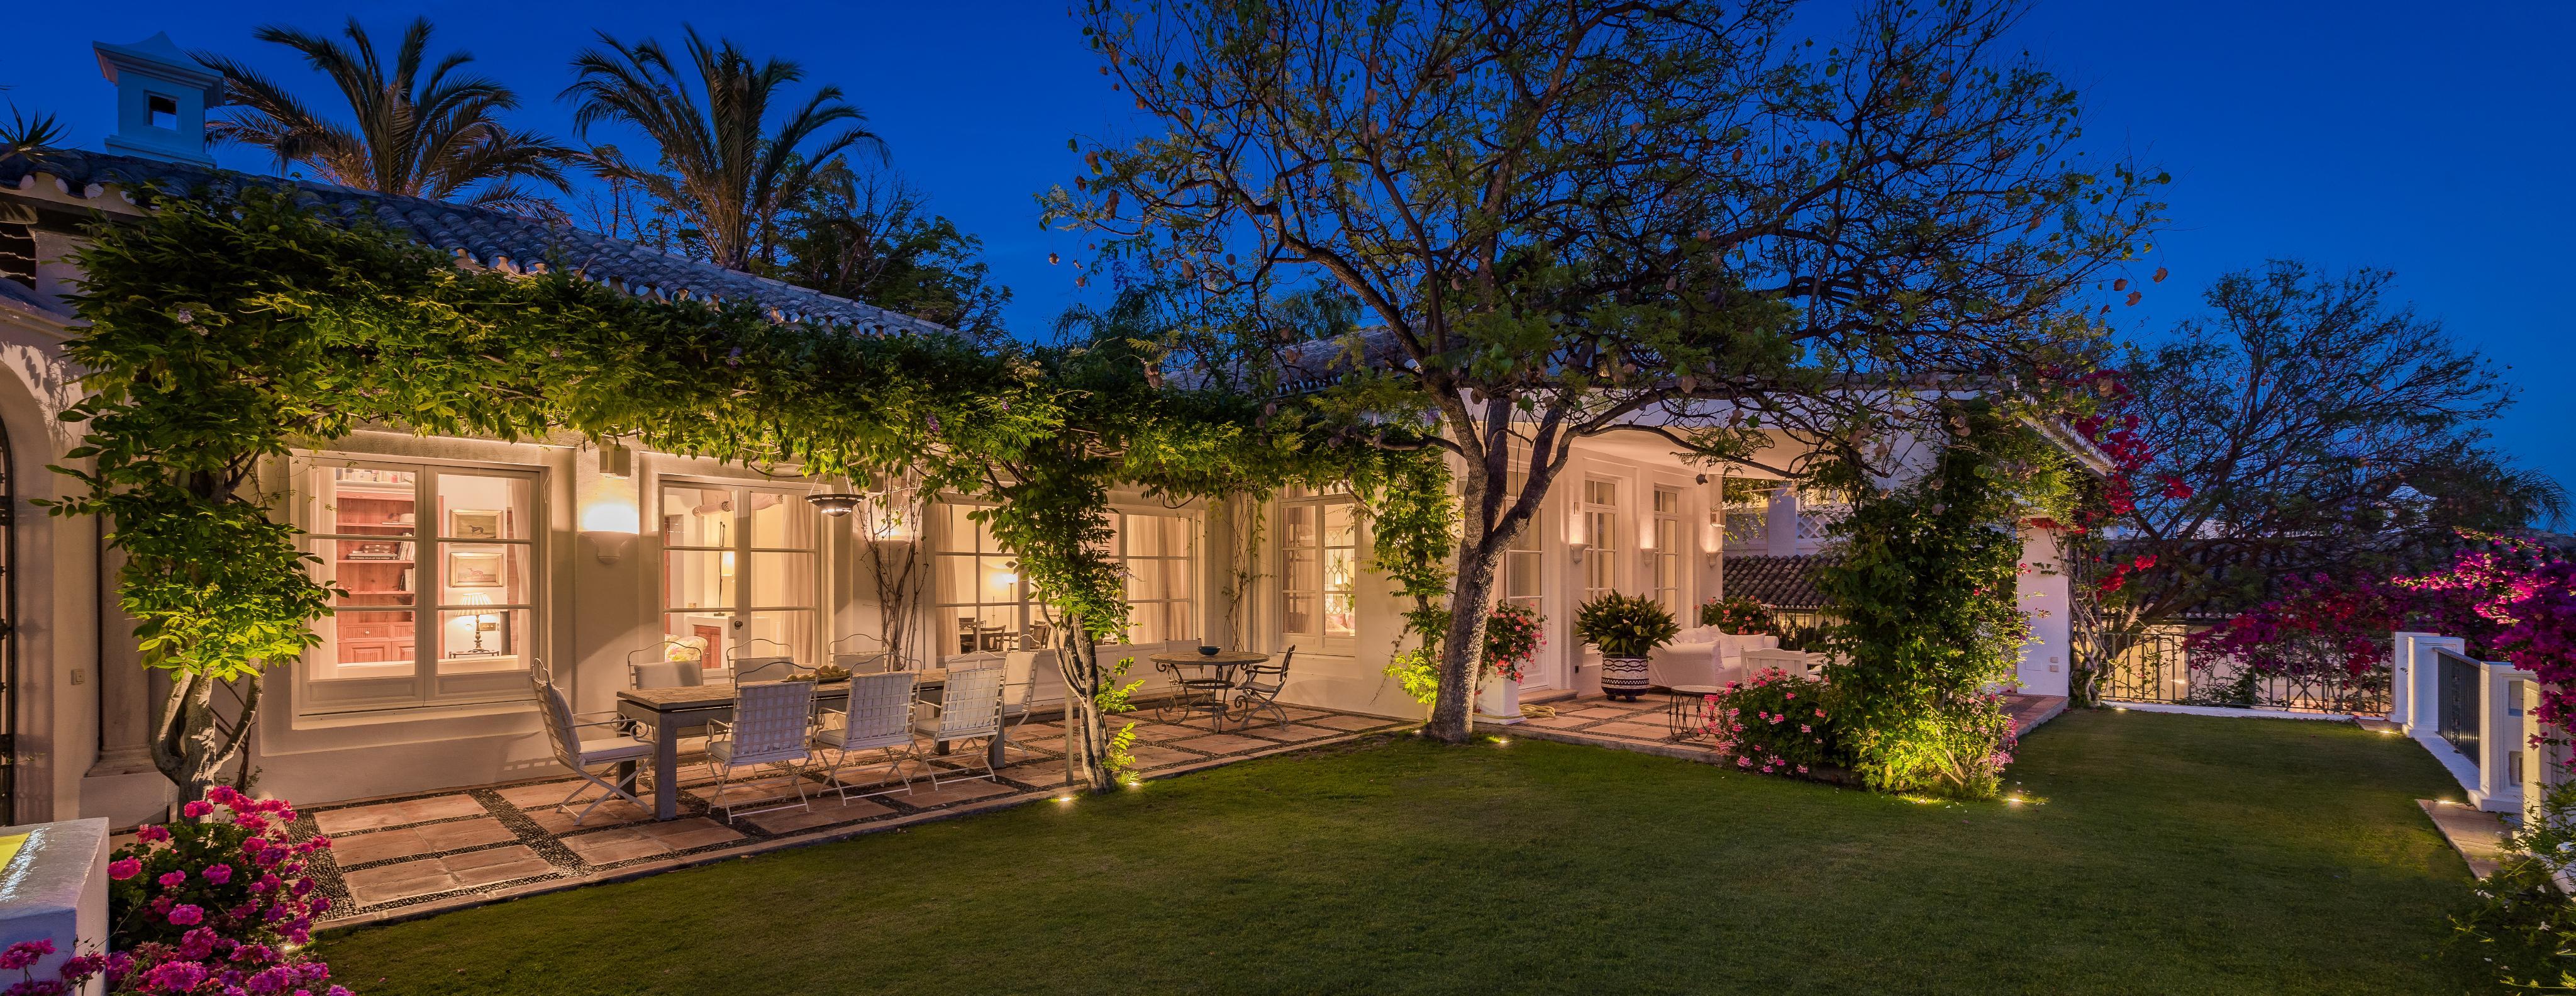 Distinguida residencia en Sierra Blanca